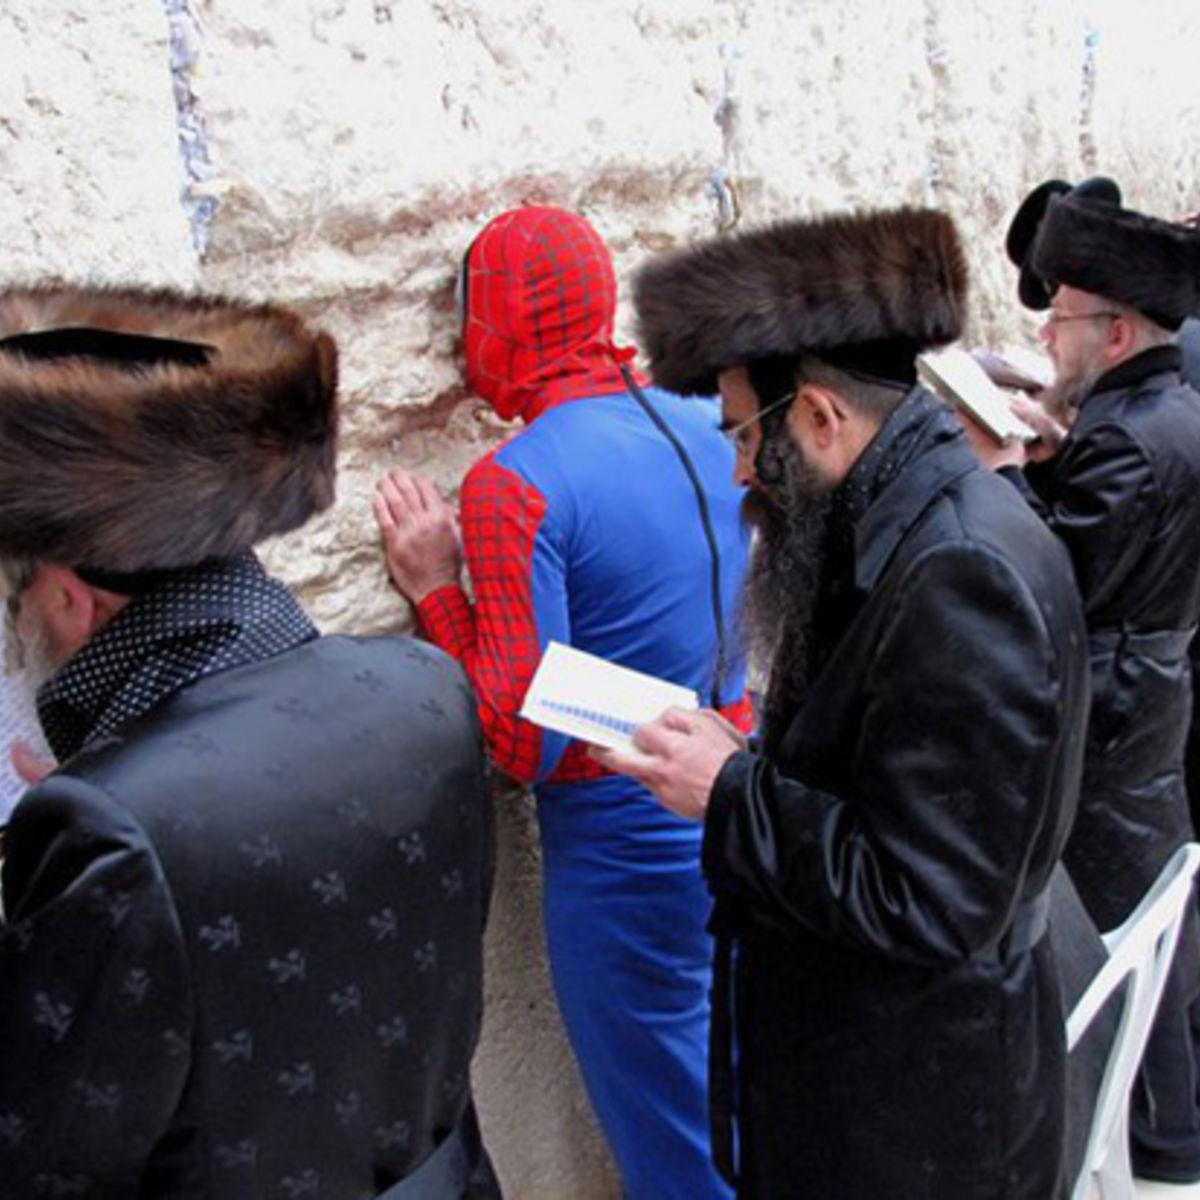 SpiderManWailingWall.jpg